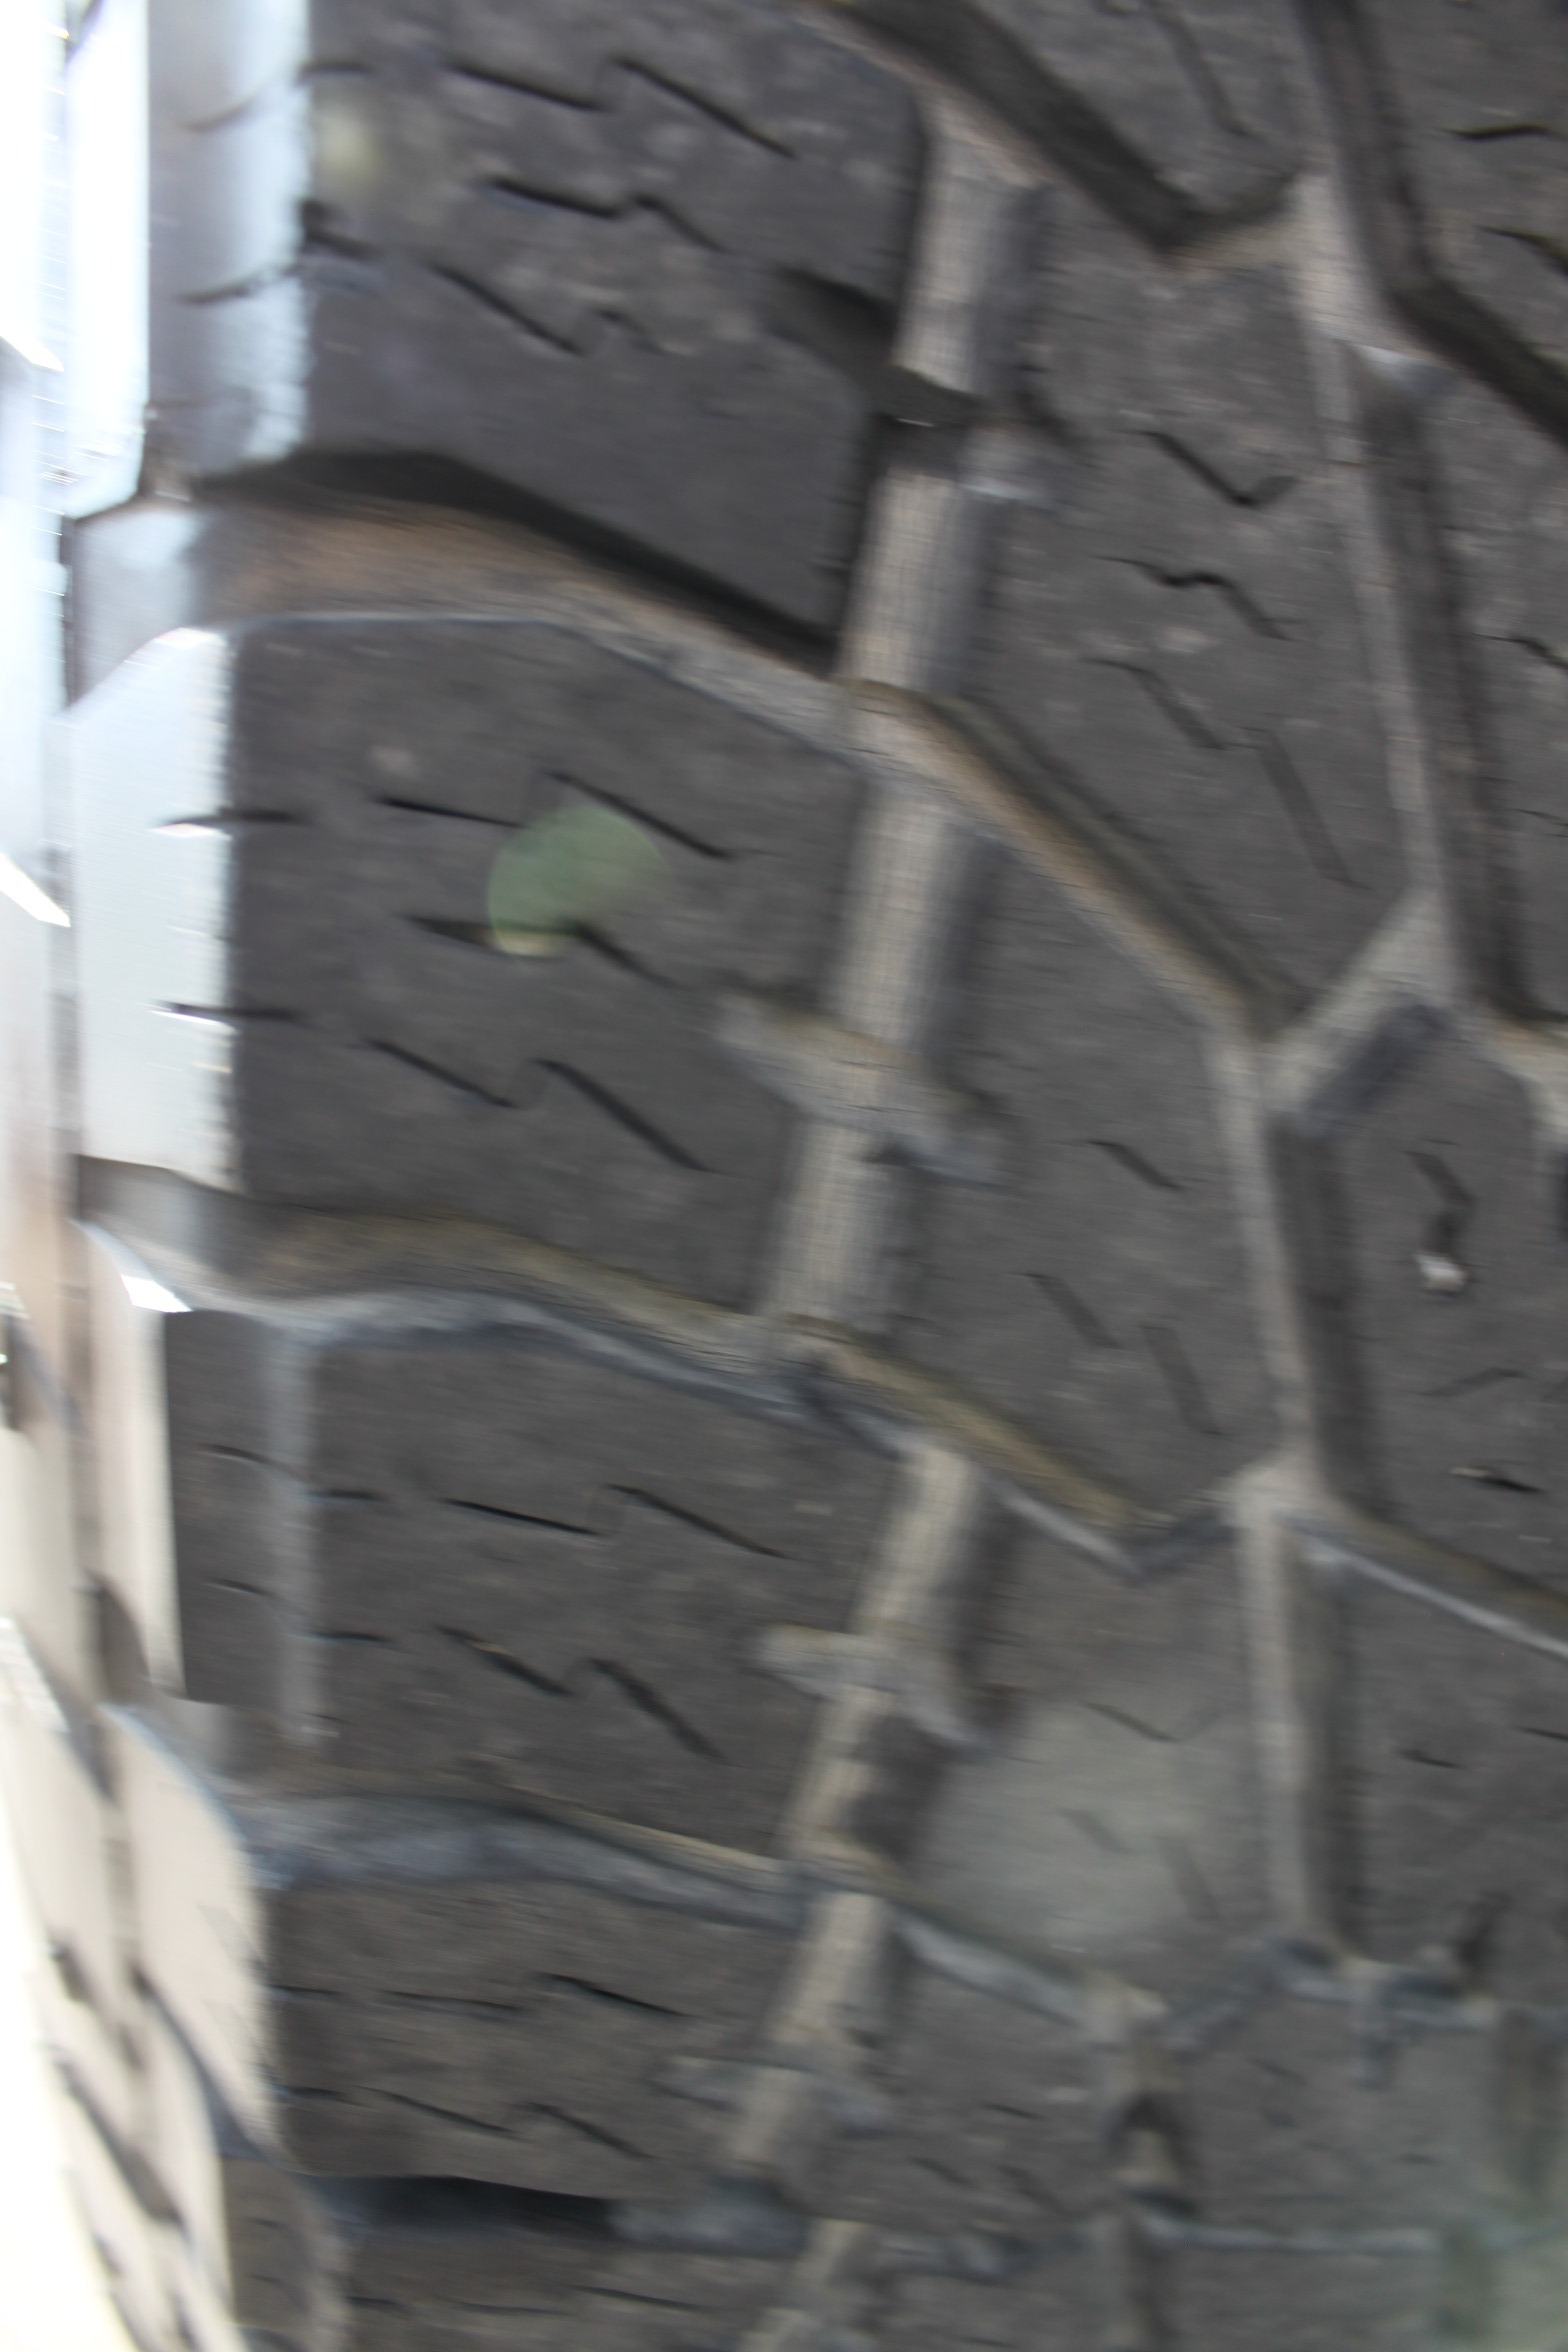 Used-2006-Jeep-Wrangler-Unlimited-LWB-BMW